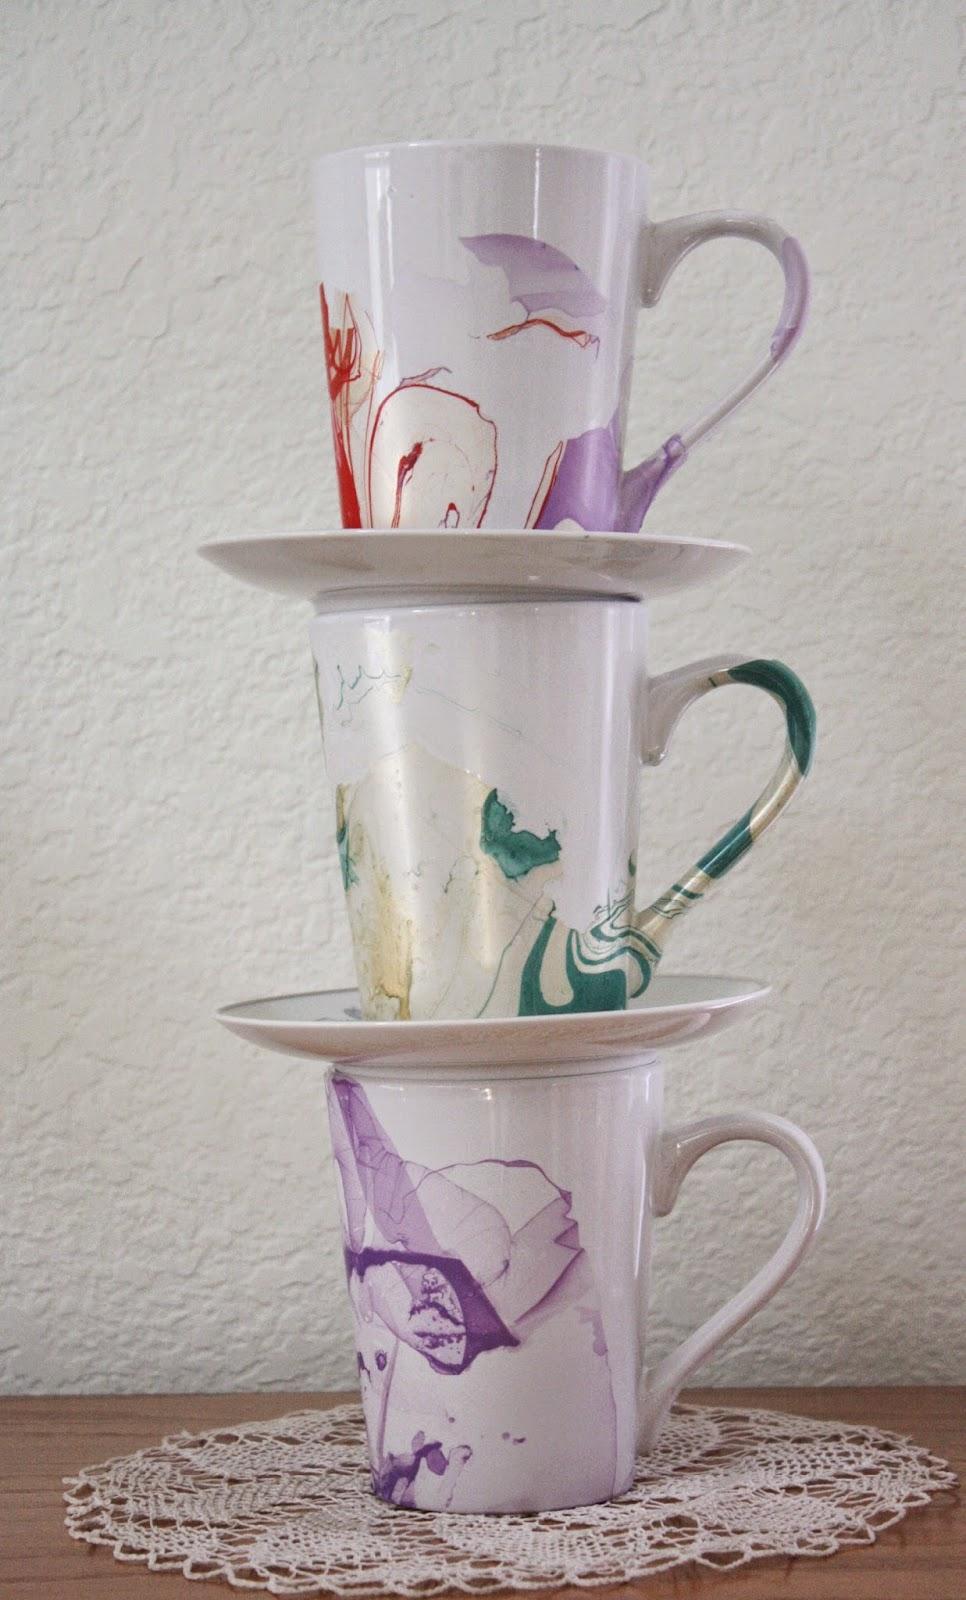 Diy Coffee Mugs With Nail Polish Mug With Nail Polish on it